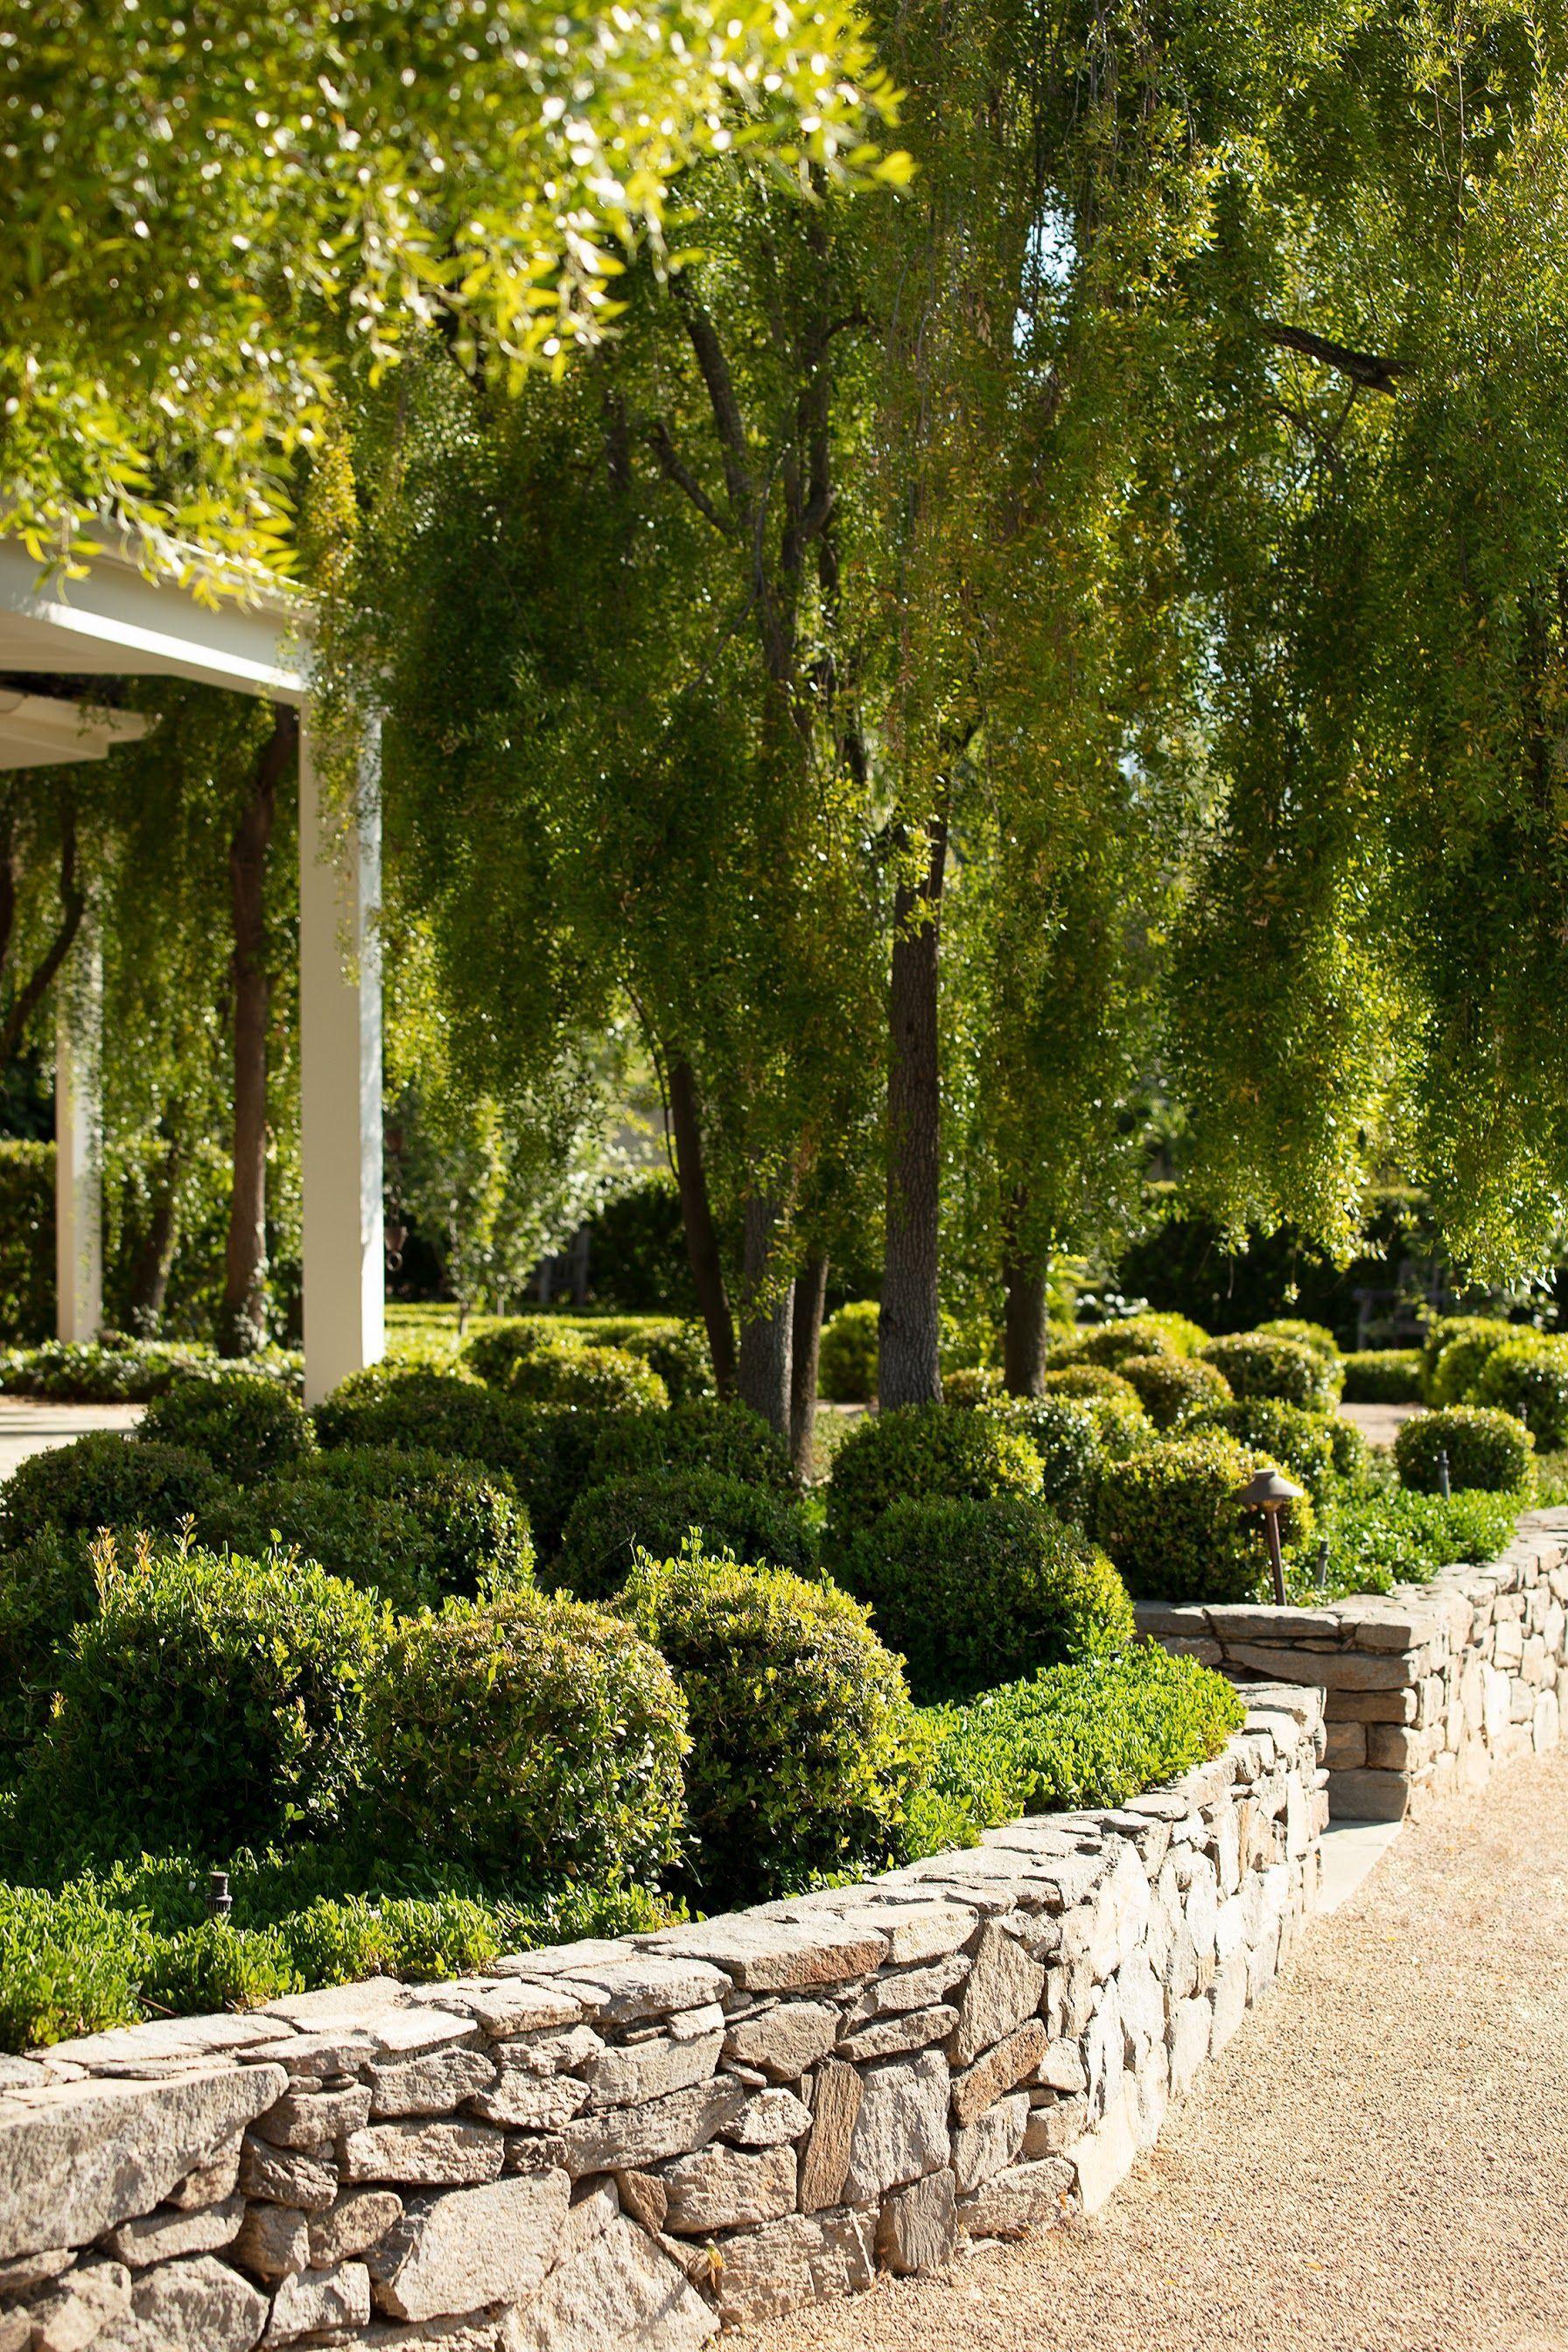 "Paul Hendershot Design, Inc #walkwaystofrontdoor All pathways lead to the front door. Project Name: ""Hamptons in a Drought."" #landscapedesign by #paulhendershotdesign paulhendershotdesign.com & in collaboration w/Kathy Fisher #landscapedesigner #topiary #topiaries #curbappeal #garden #gardendesign #jardin #garten #dwell #frontyard #path #pathway #driveway #walkway #exterior #exteriordesign #landscape #homedesign #homeimprovement #home #house #outdoorliving #courtyard #lifestyle #walkwaystofr #walkwaystofrontdoor"